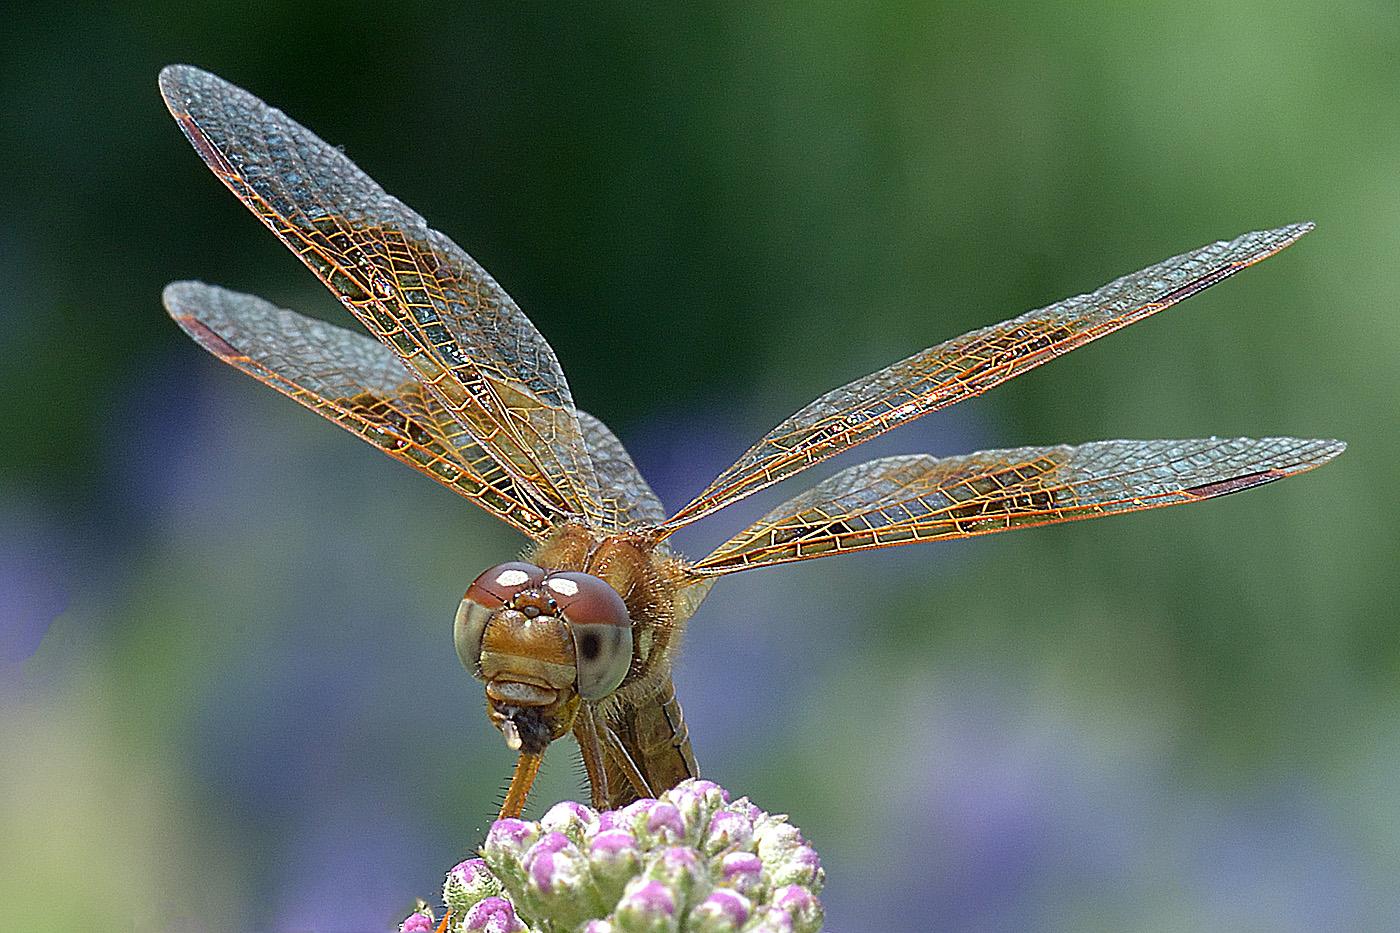 1st-31~A~Dragonfly~VanDijk Leo